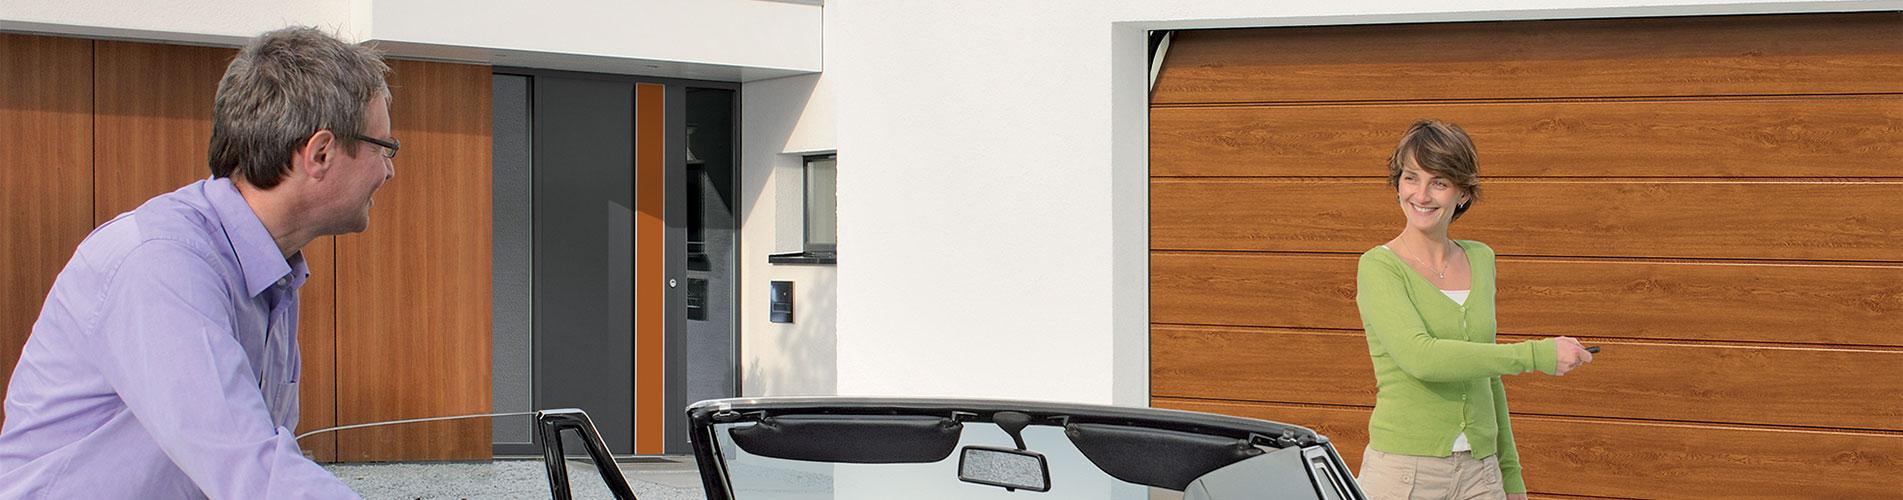 Contact Access Garage Doors